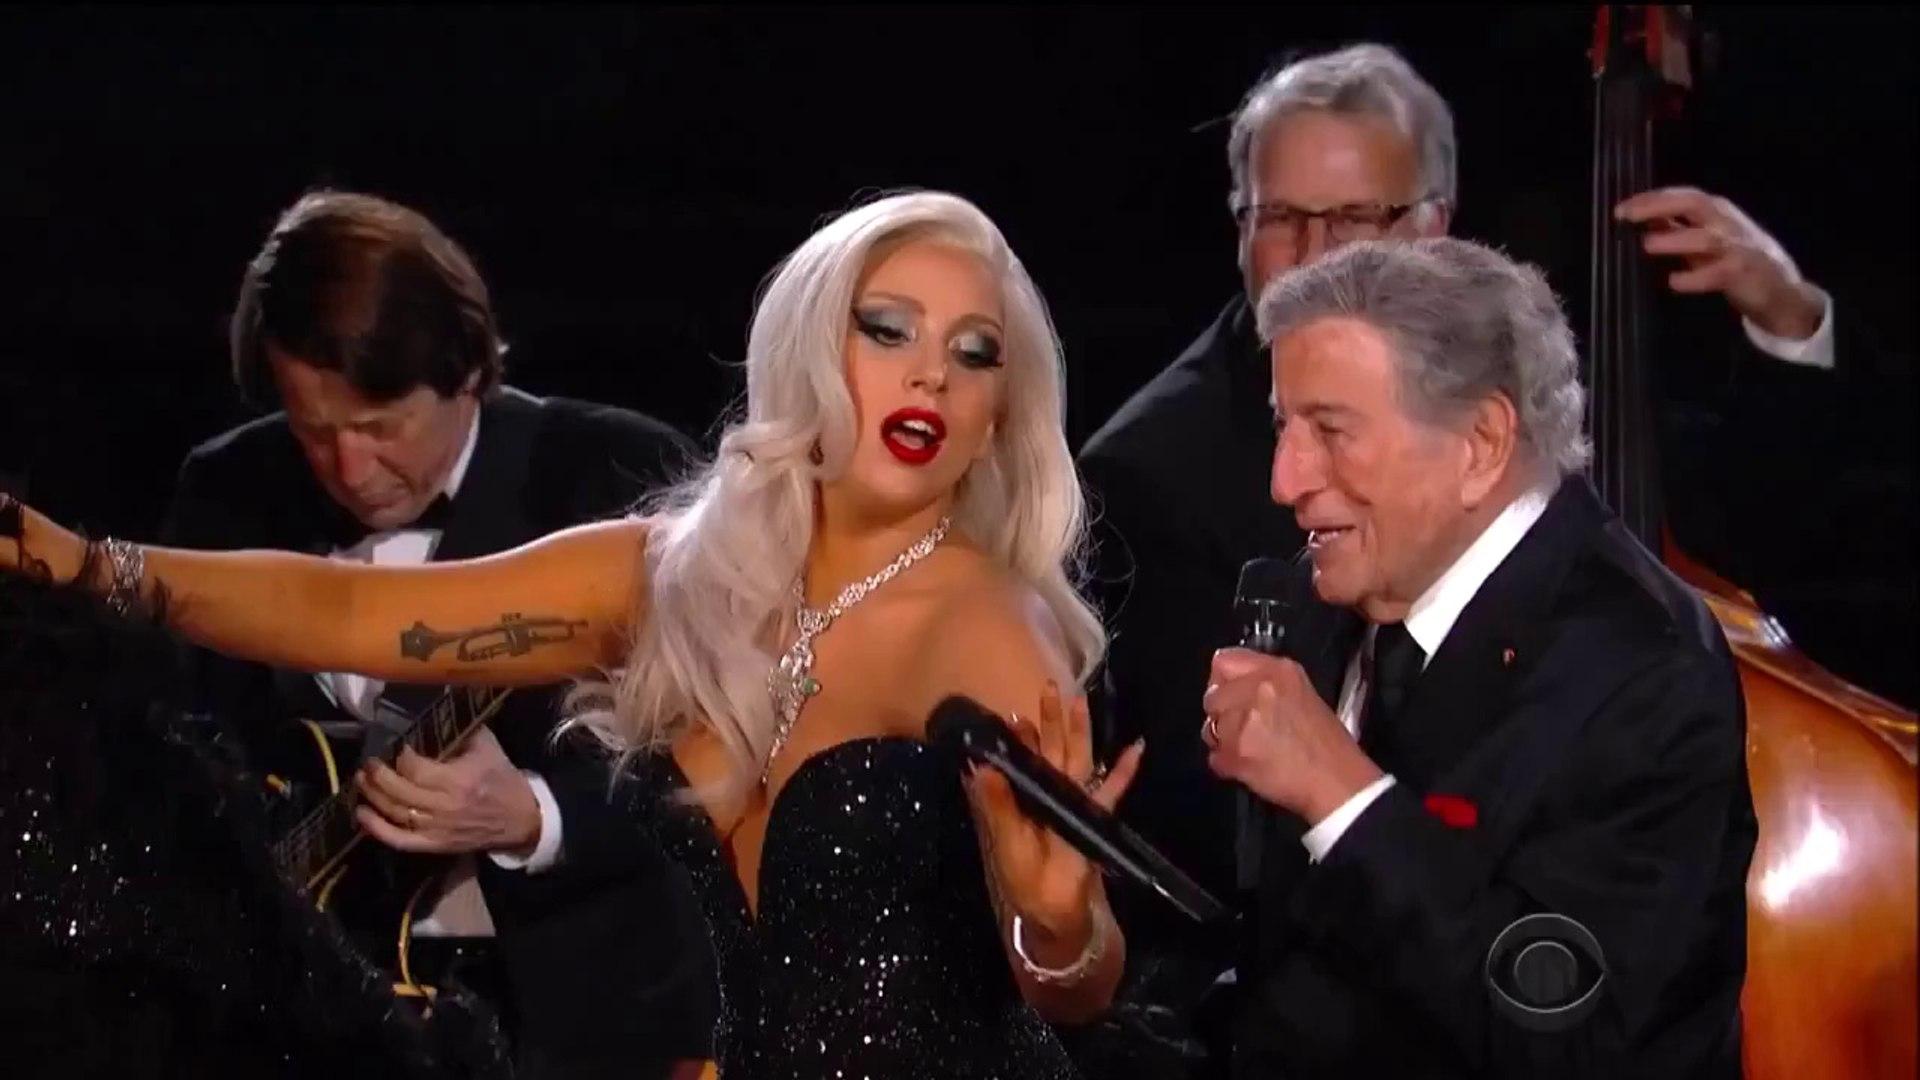 Tony Bennet + Lady Gaga - Cheek To Cheek - Grammy Awards 2015 HD 720p